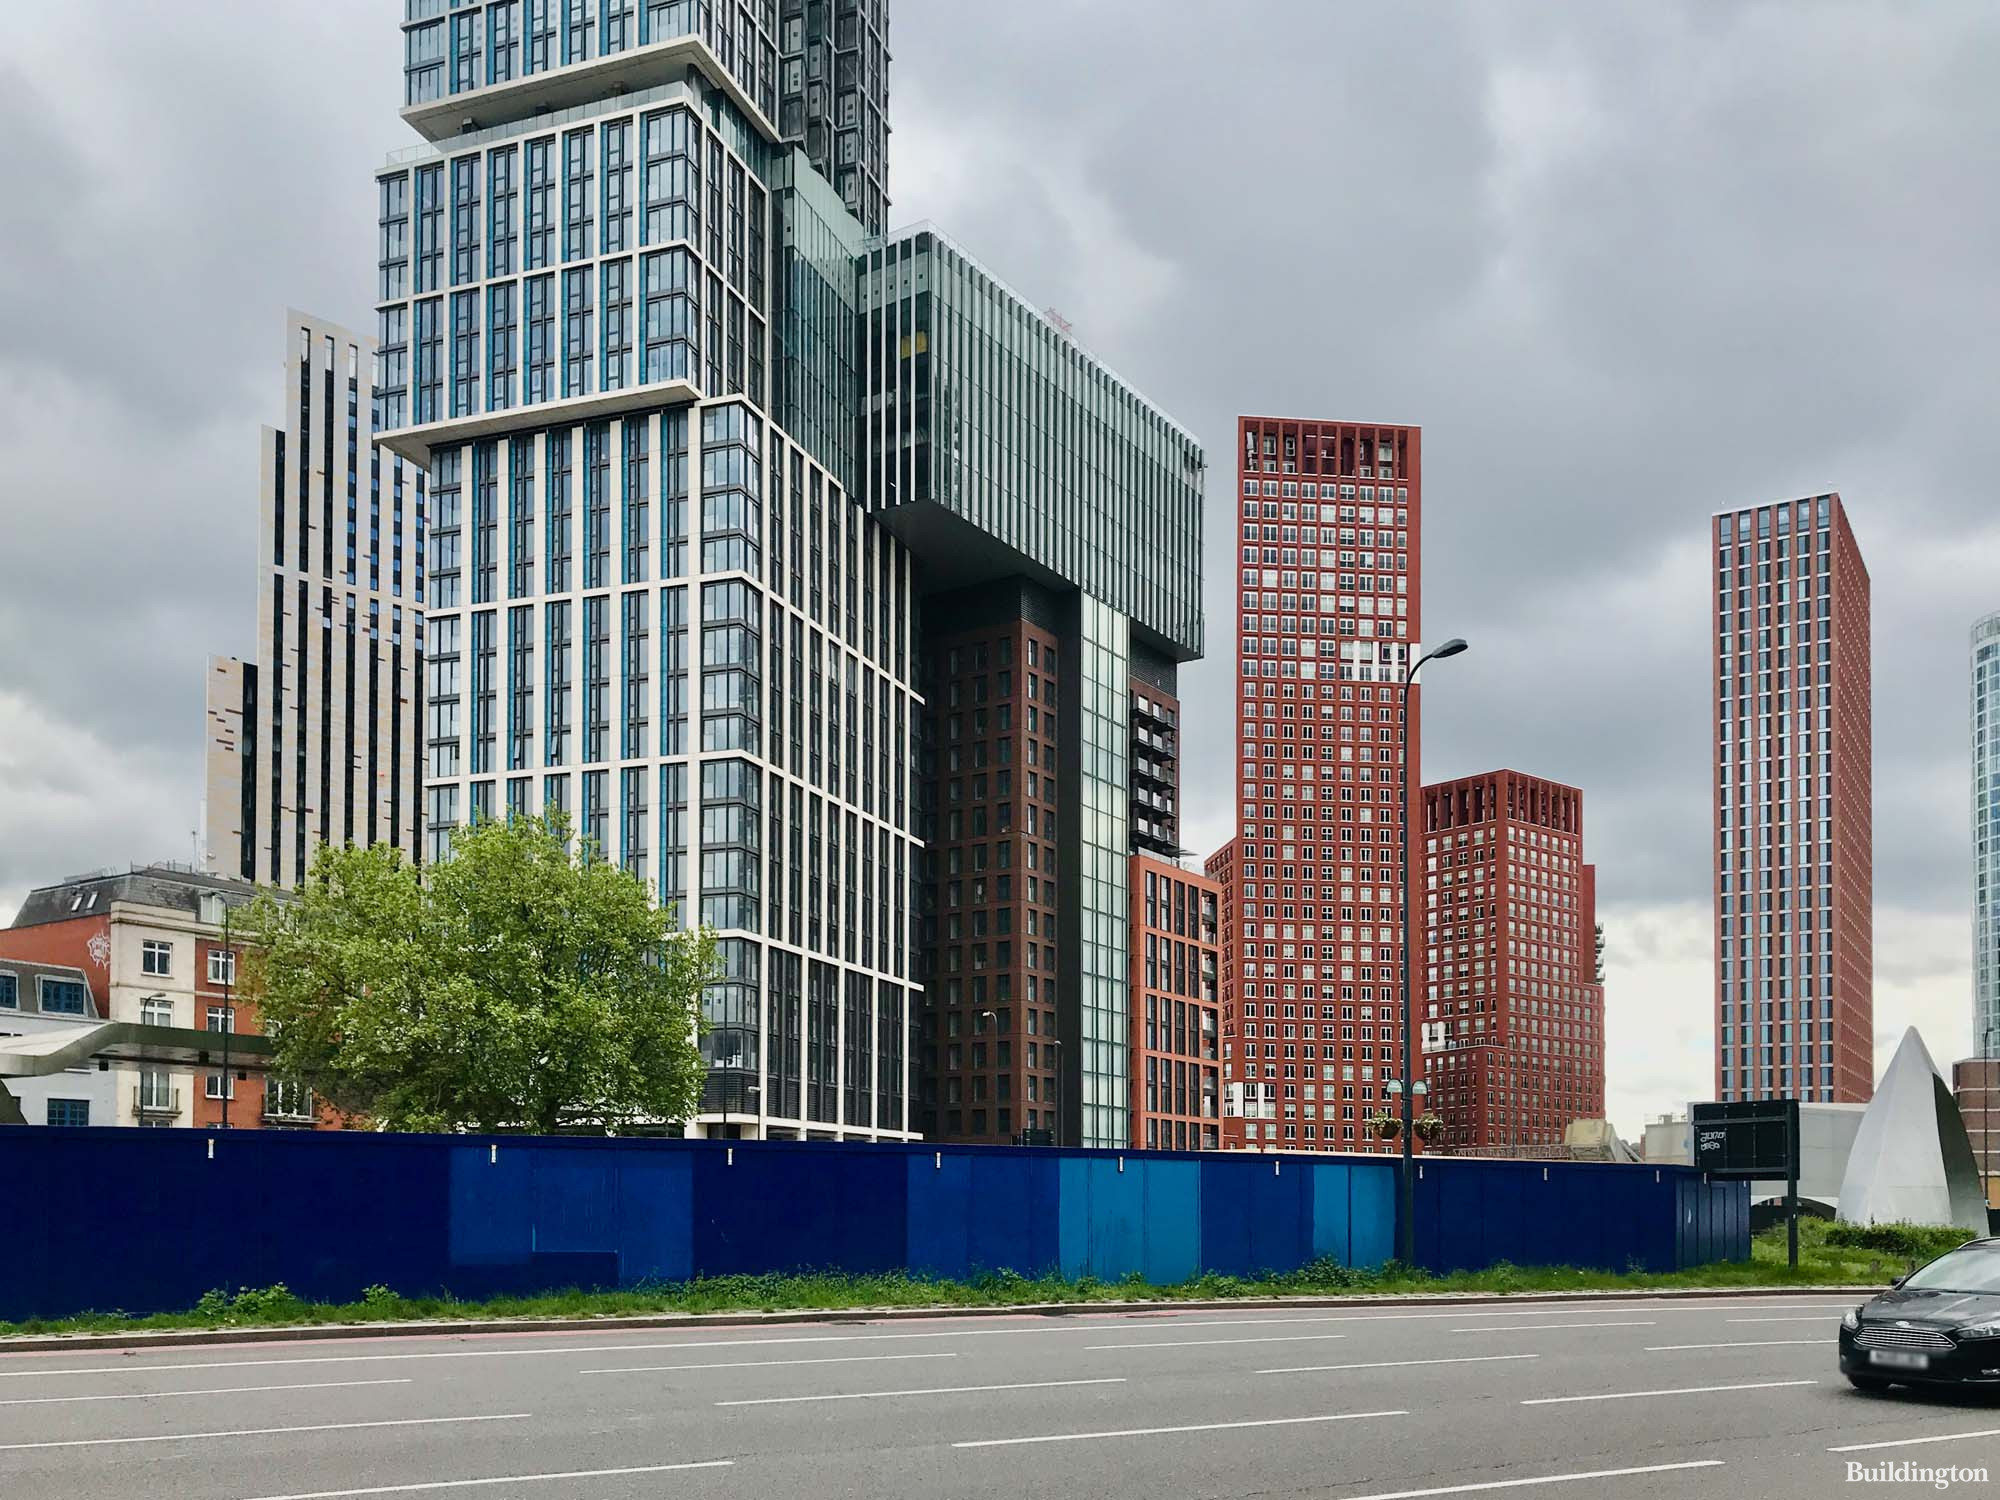 Vauxhall Cross Island development site across the road from Damac Tower.